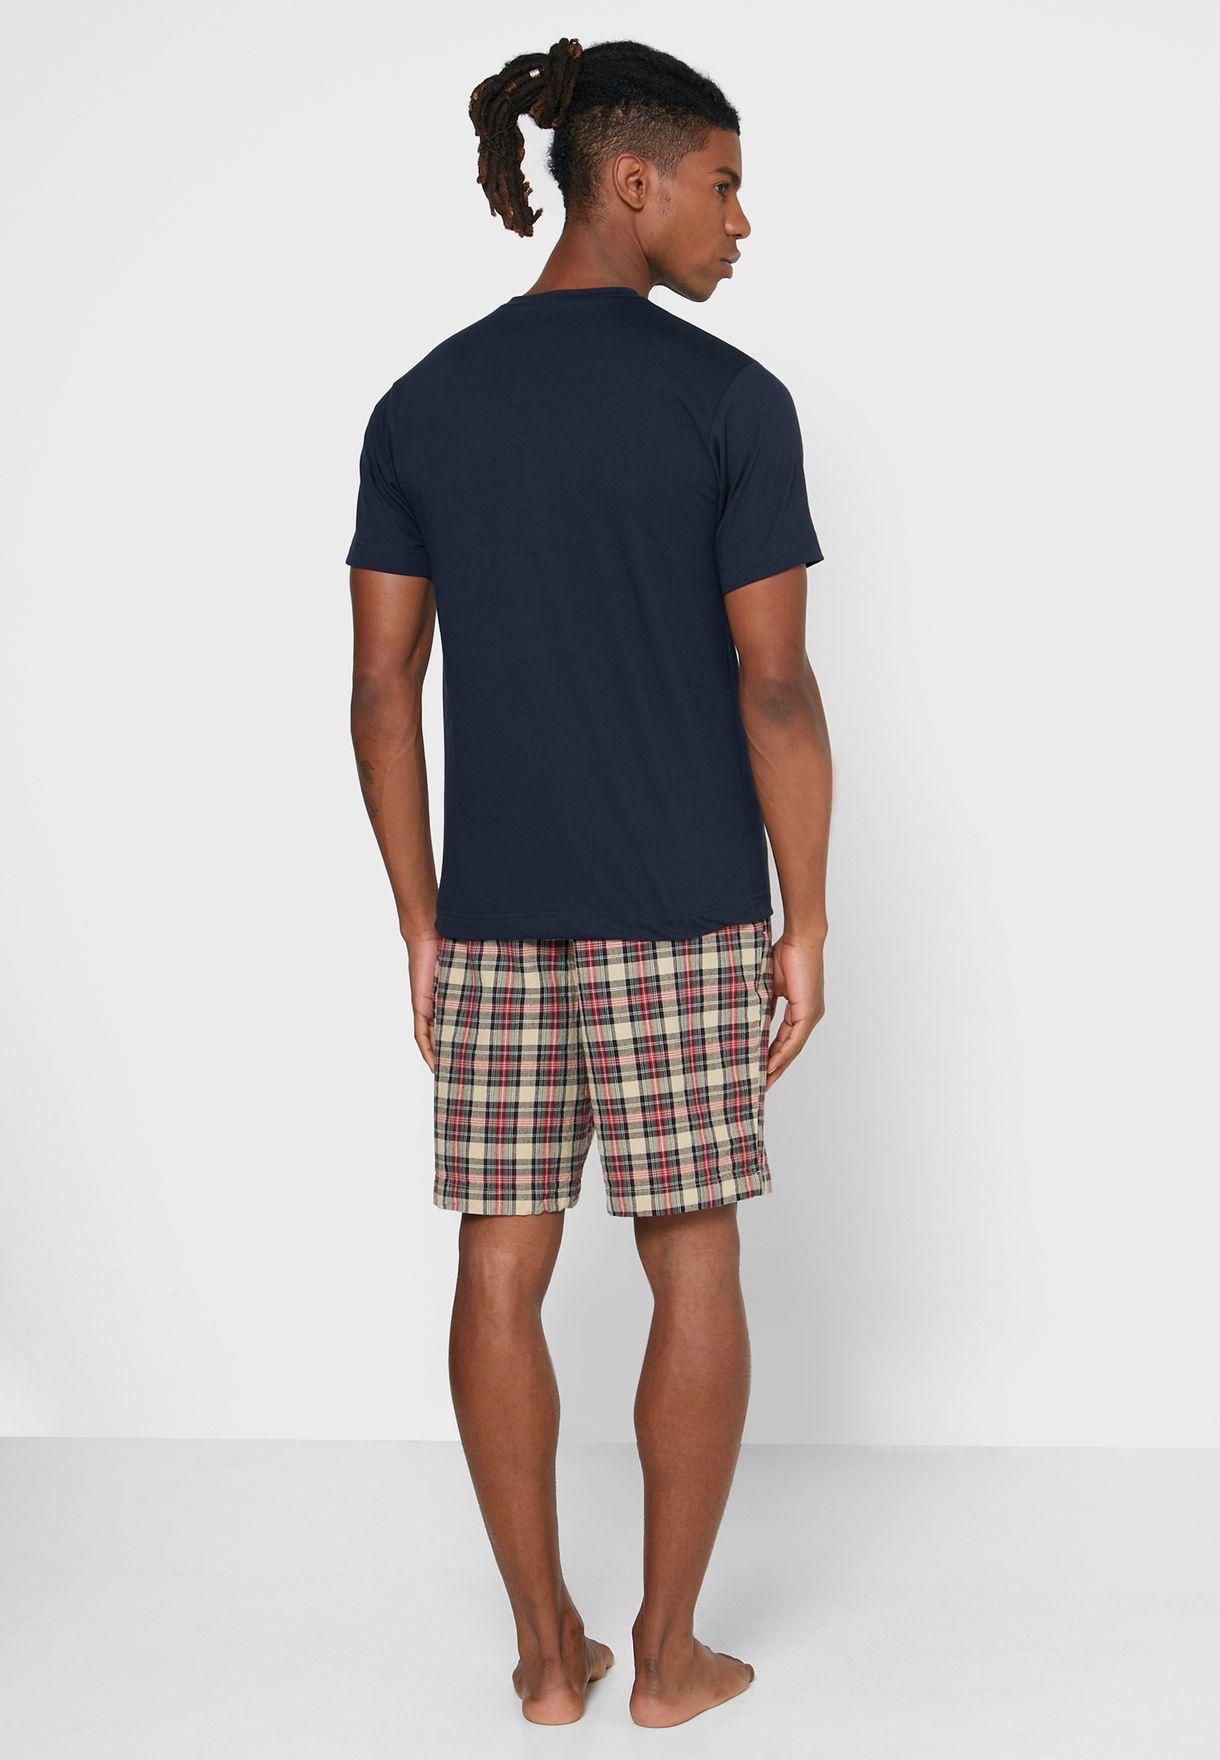 T-Shirt & Checked Pyjama Shorts Set